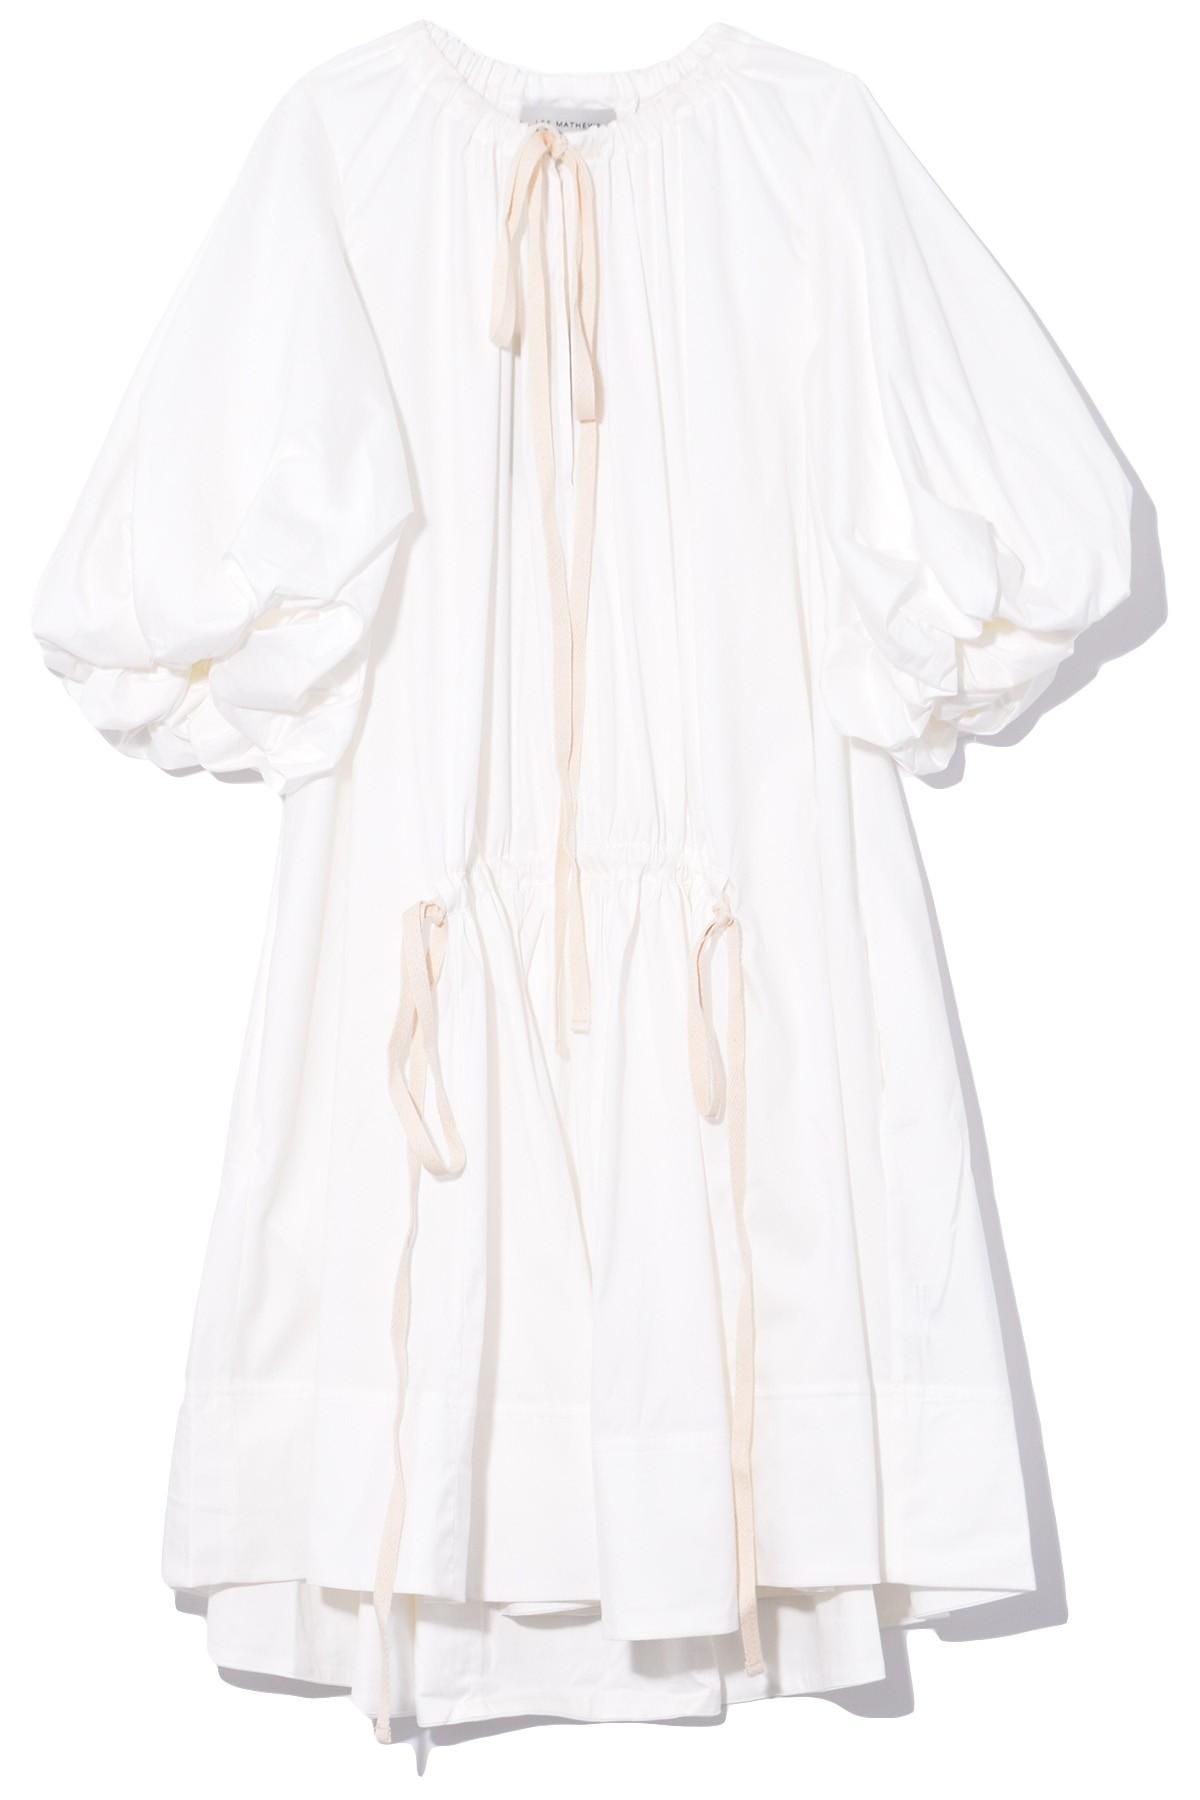 xlee-matthews-elsie-tunic-dress-in-natural.jpg.pagespeed.ic.8ykLL3WF6W.jpg